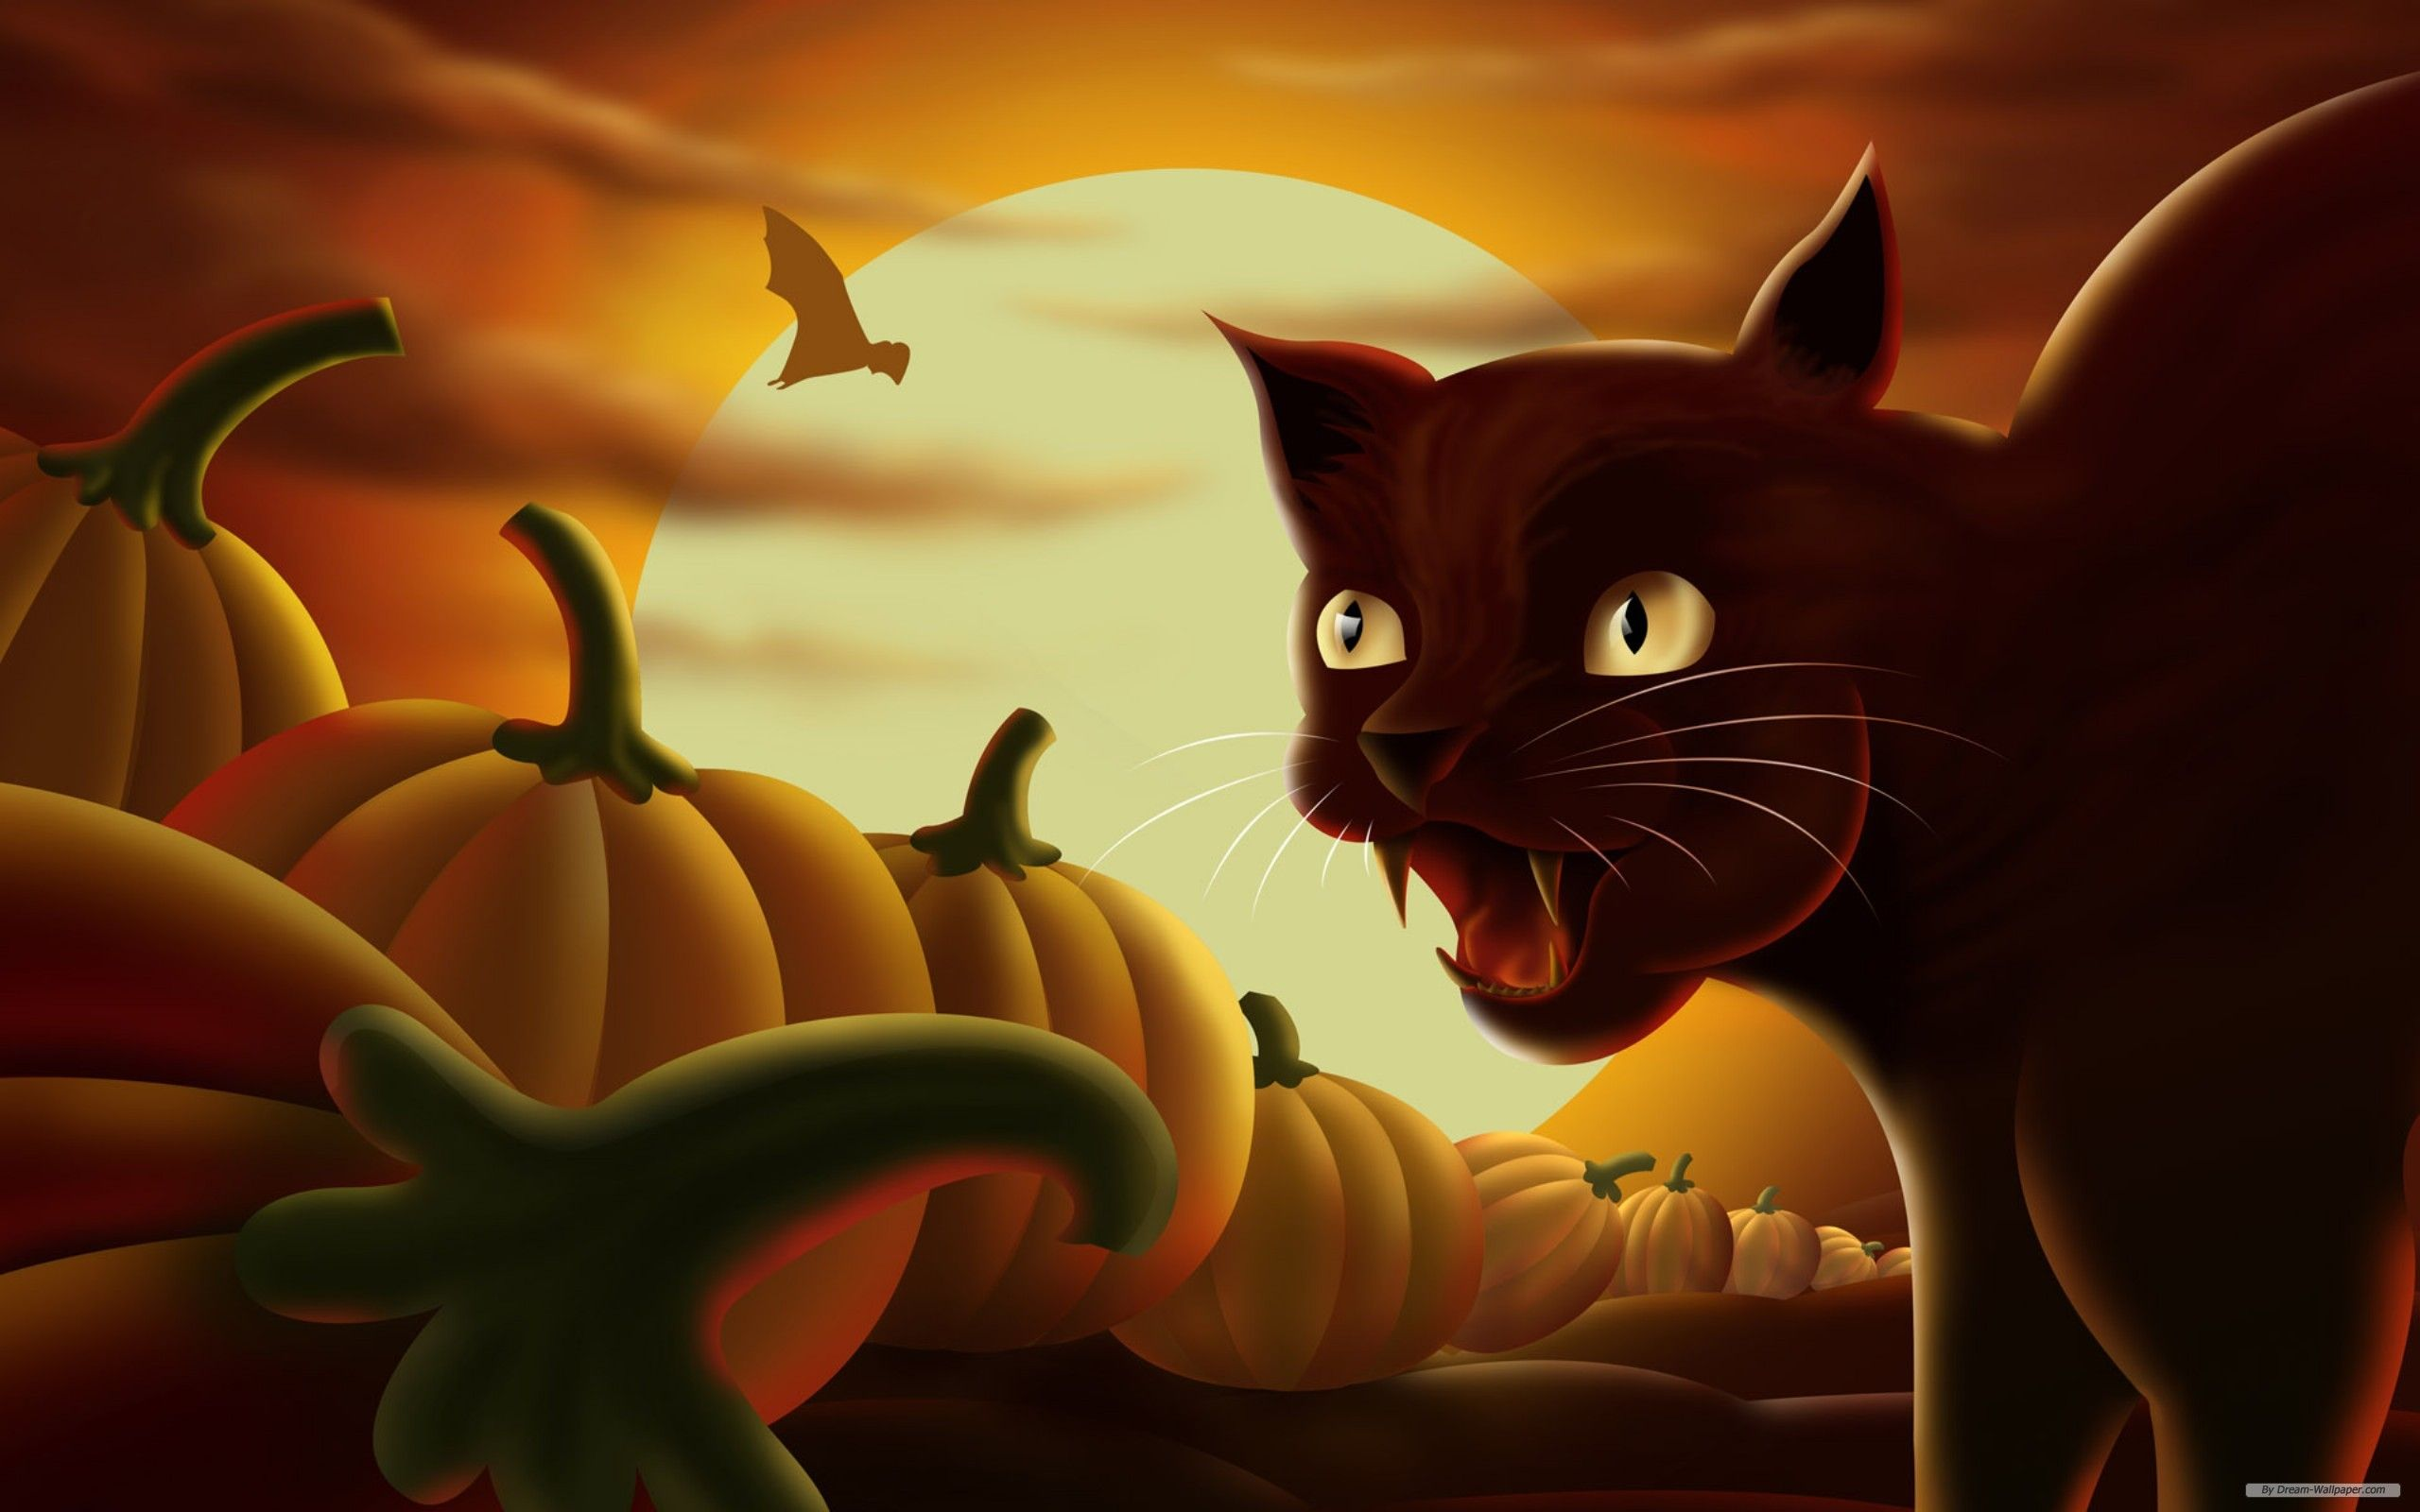 Vacances Halloween Fond D Ecran Fond D Ecran Halloween Photo Halloween Chat Halloween